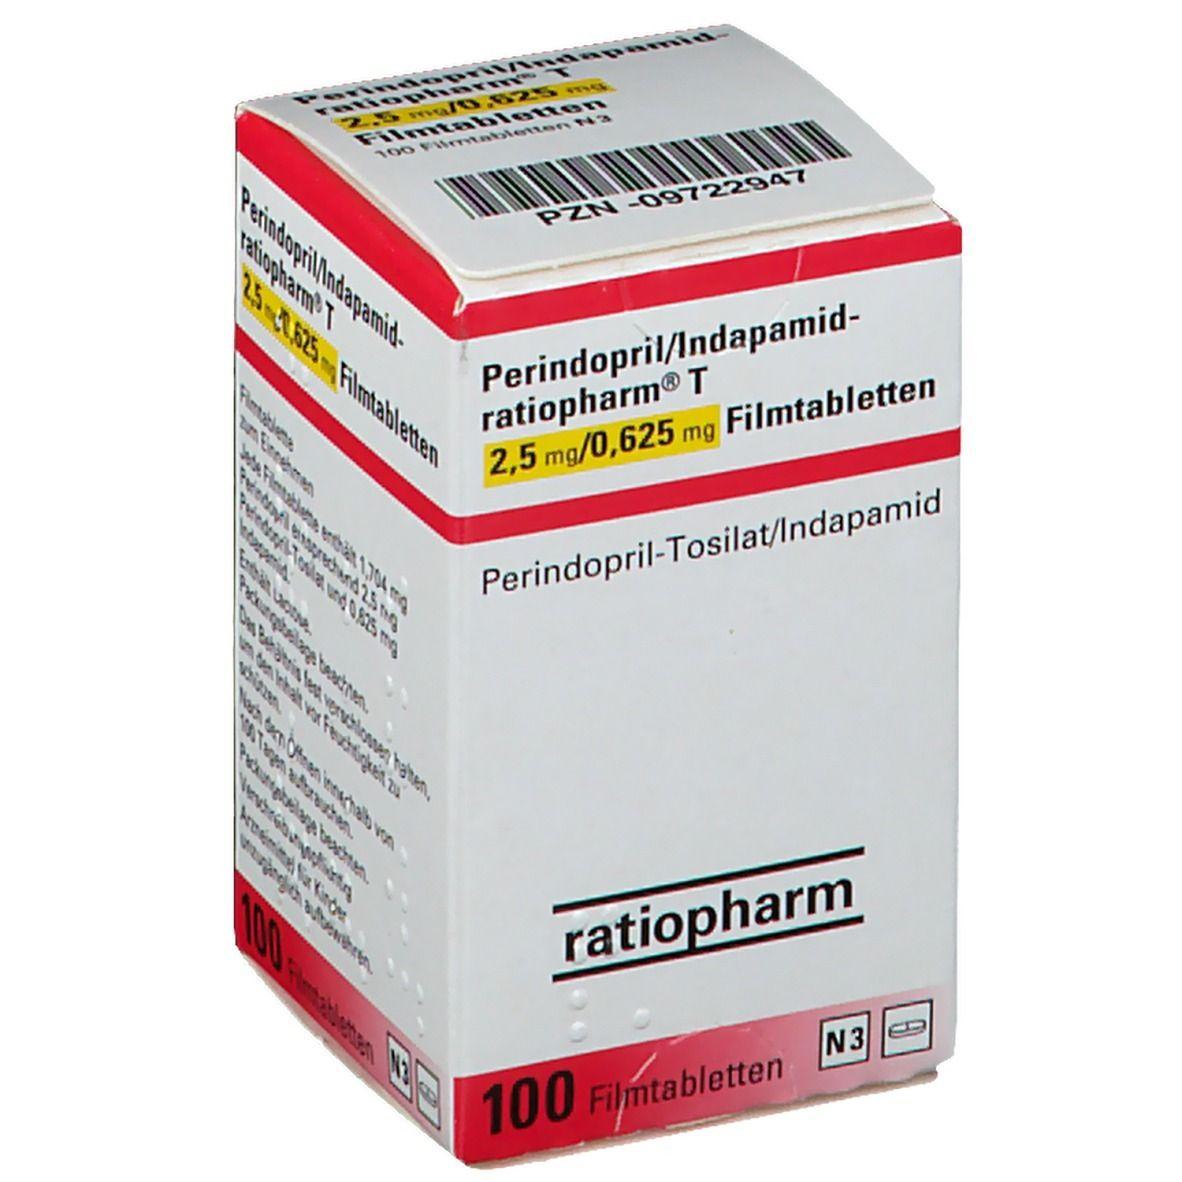 Perindopril/Indapamid ratiopharm® T 220,220 mg/20,6220220 mg 12020 St   shop ...